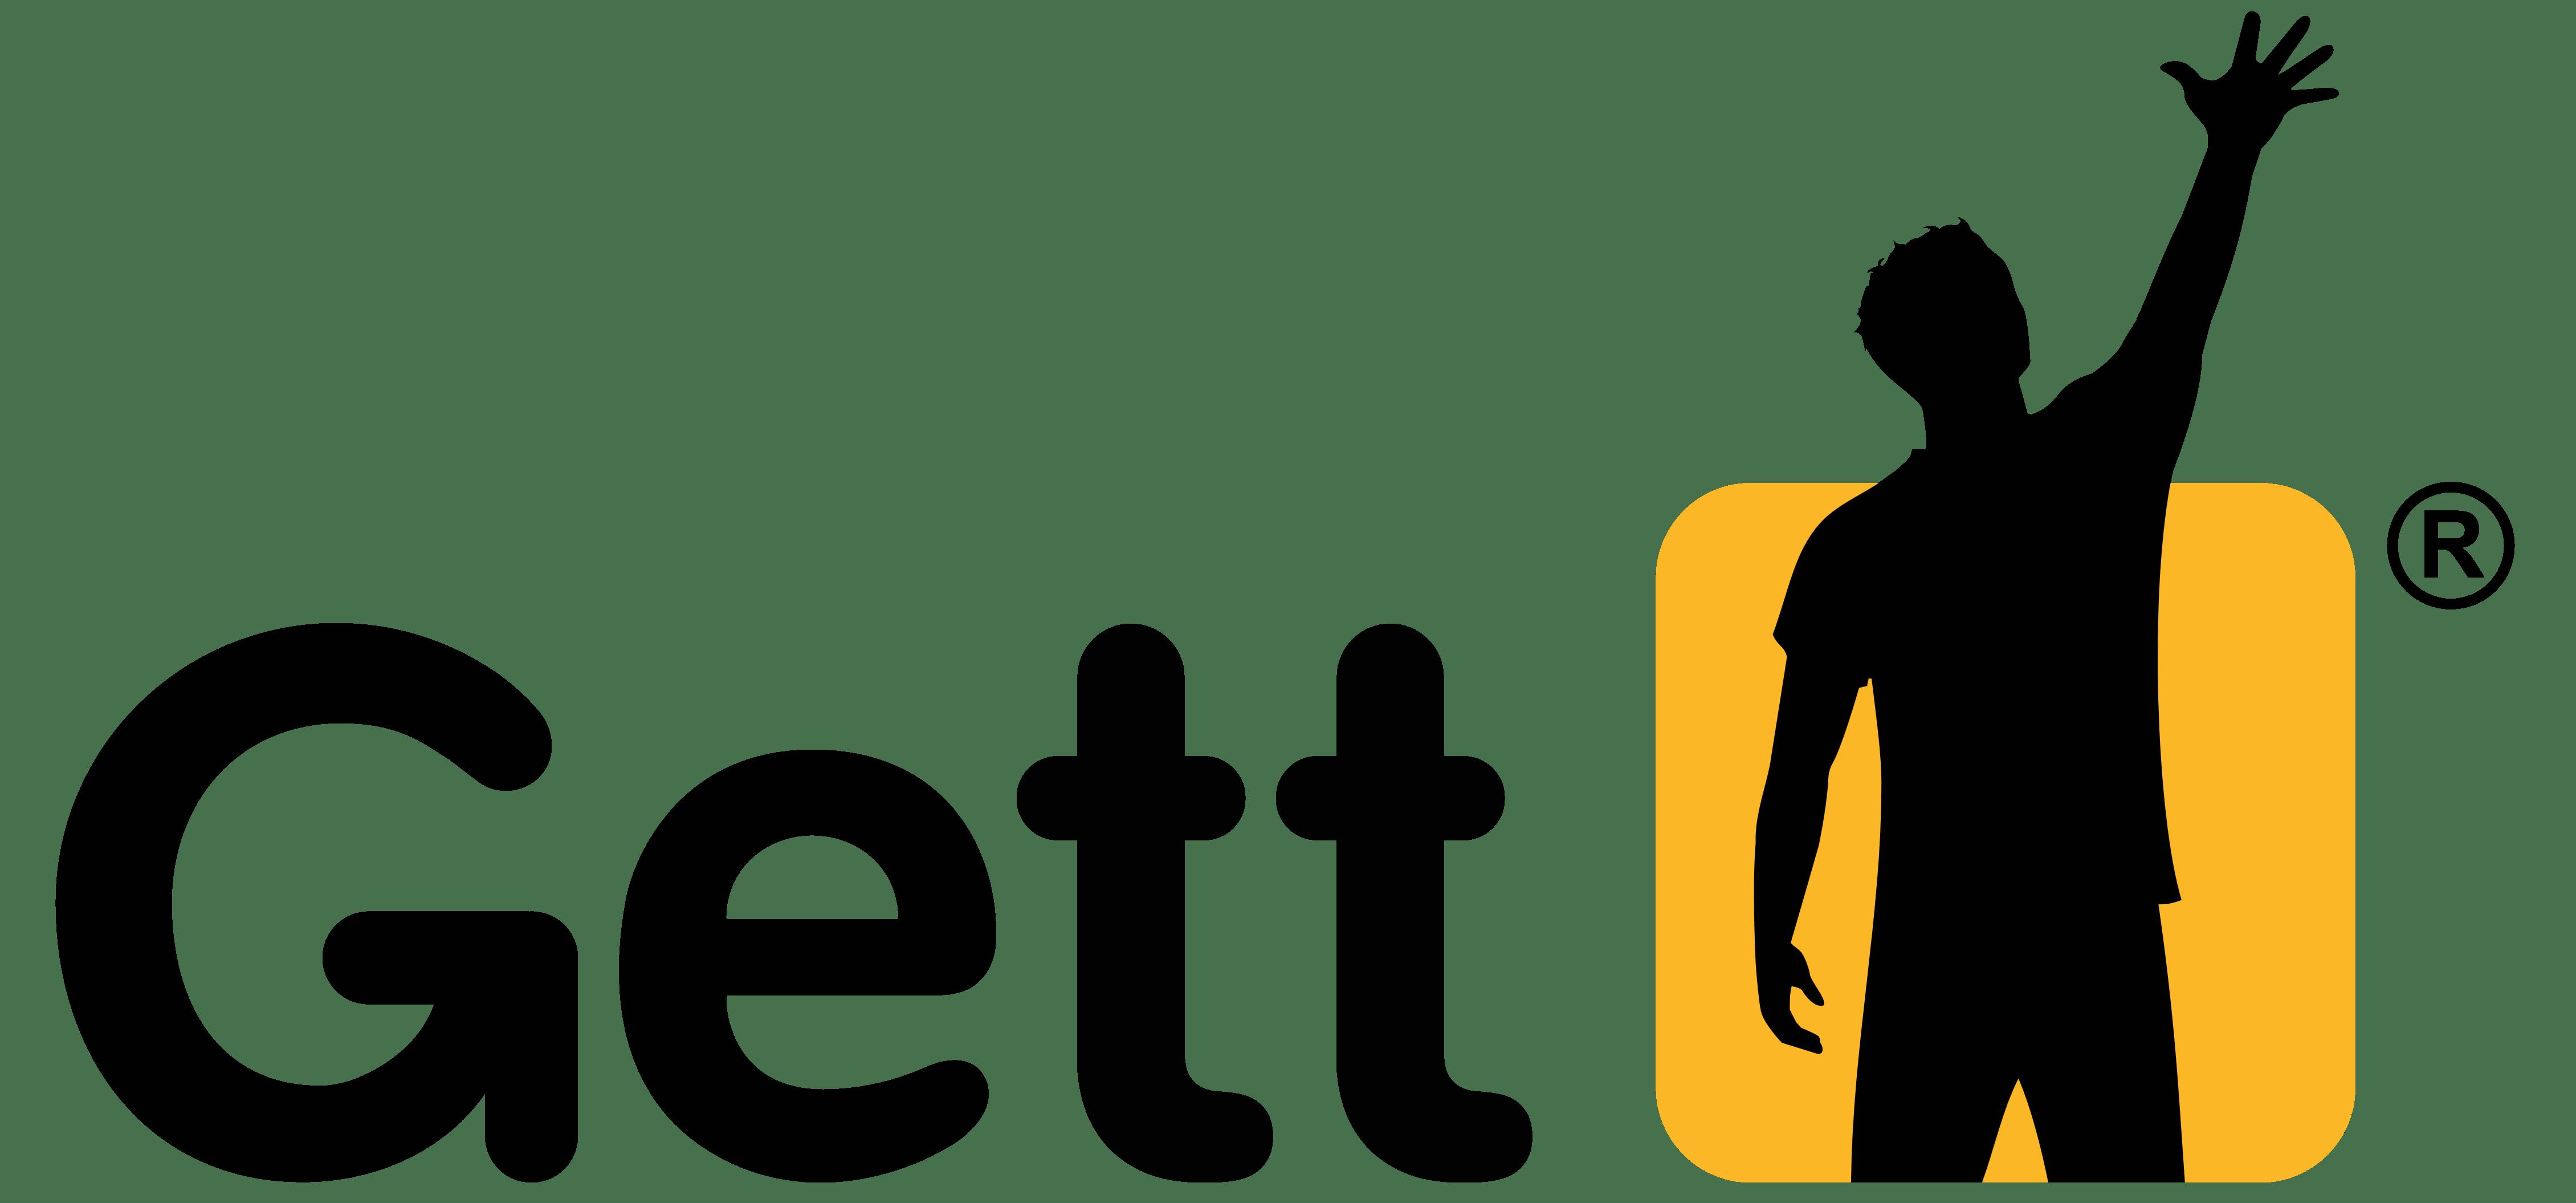 Gett company logo